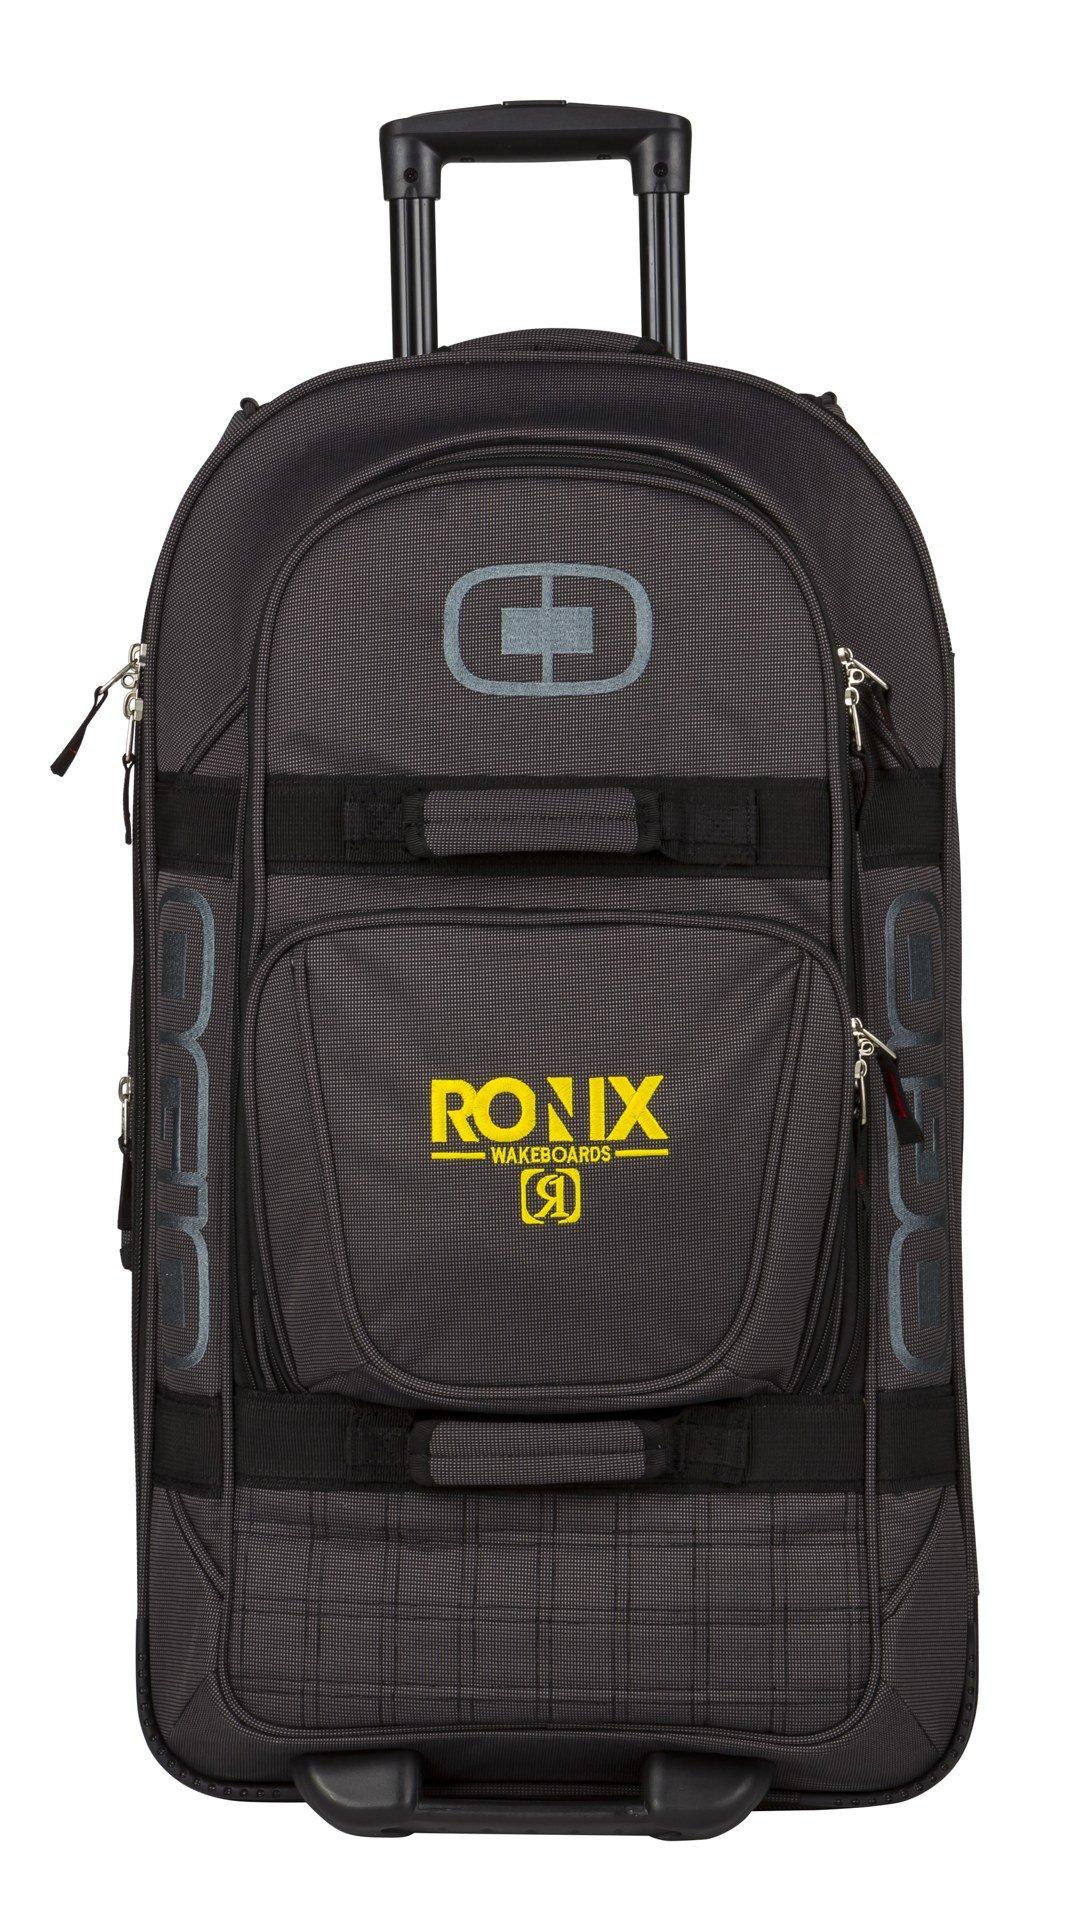 Ronix OGIO Terminal Travel Bag